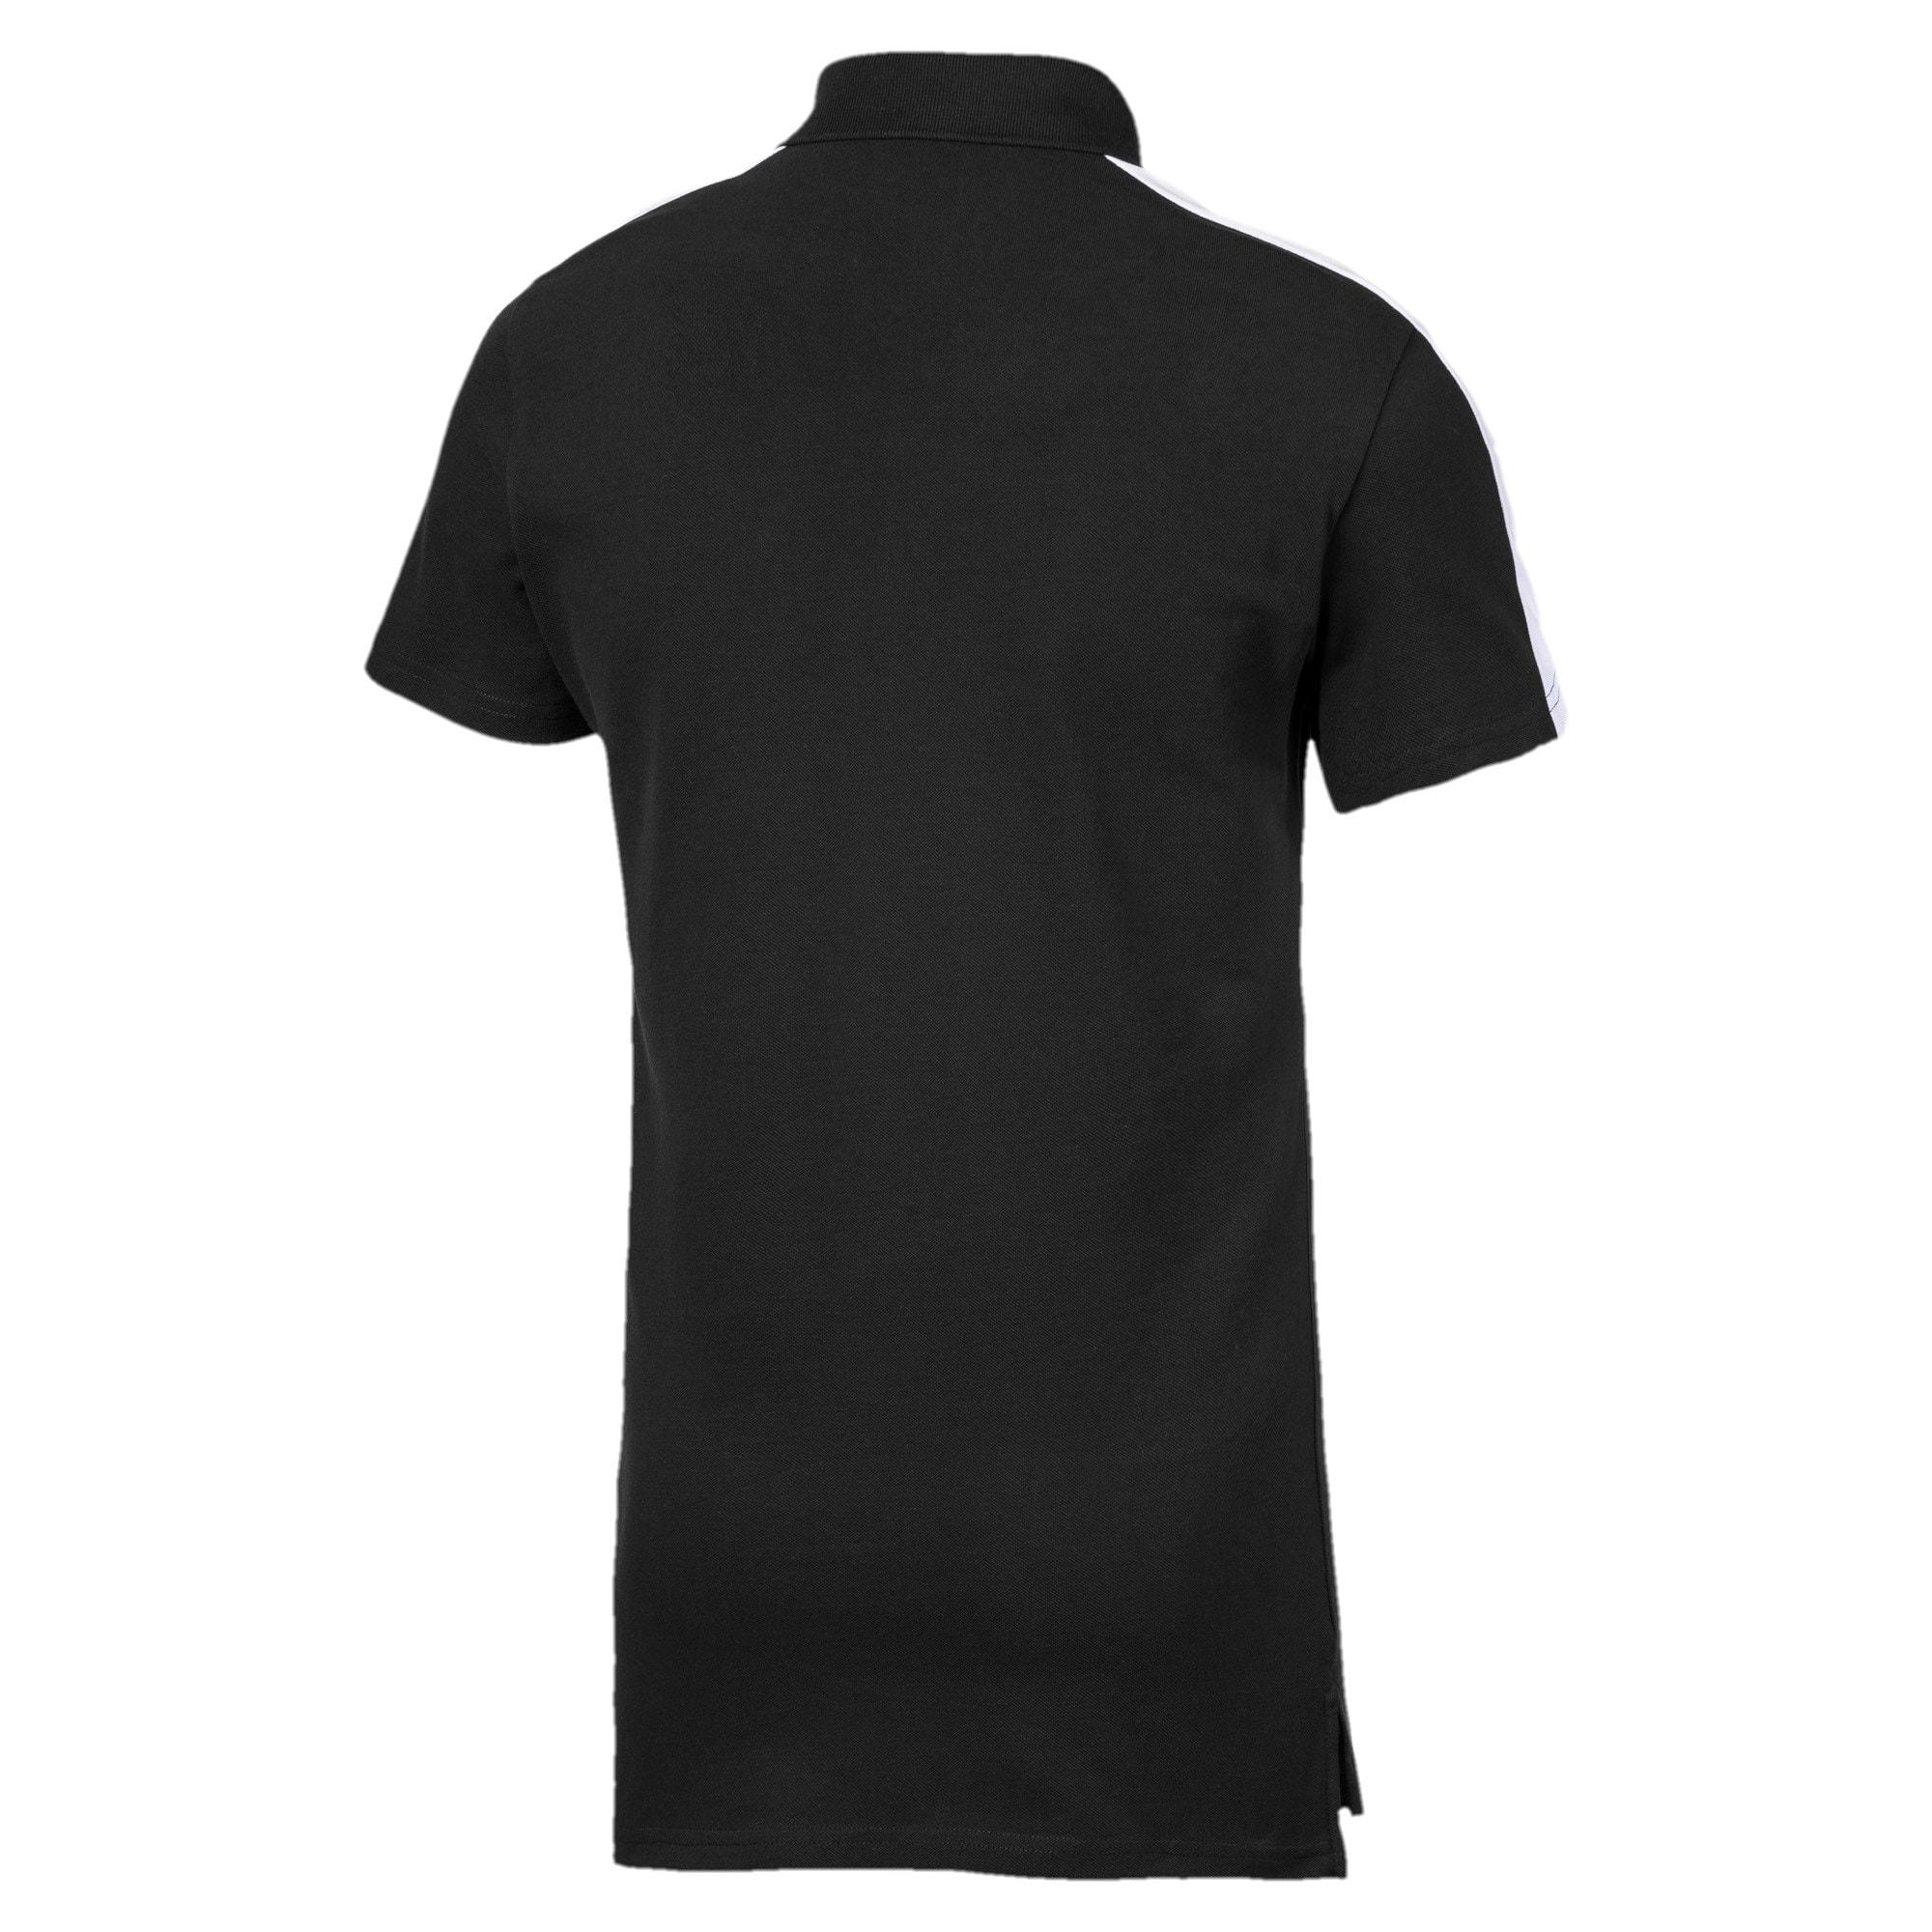 Miniatura 5 de Camiseta tipo polo T7 icónica para hombre, Puma Black, mediano